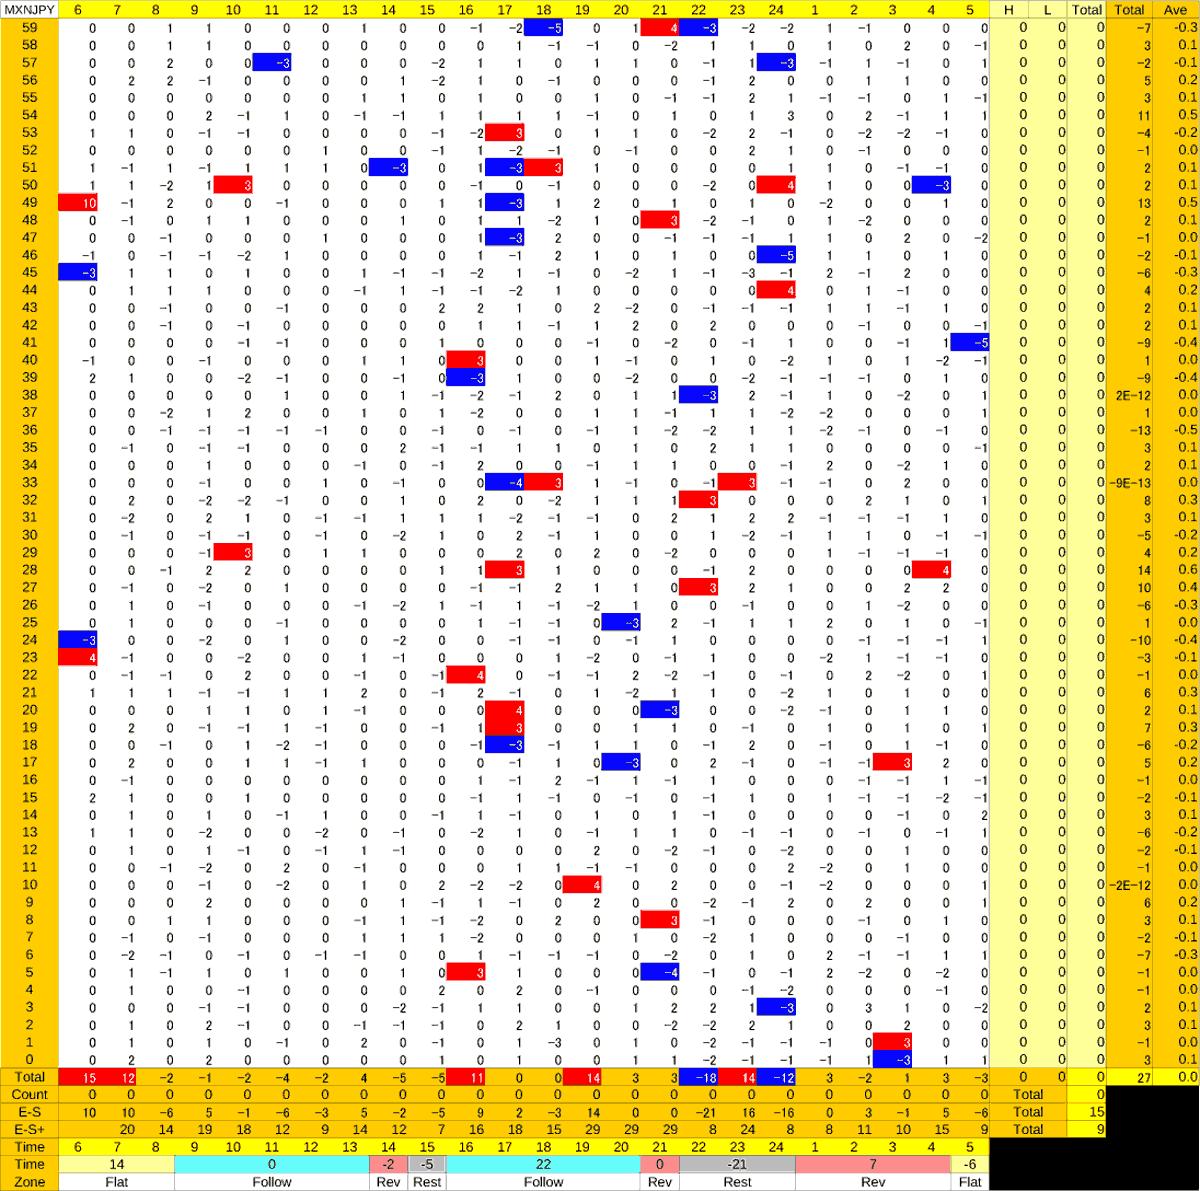 20200715_HS(3)MXNJPY